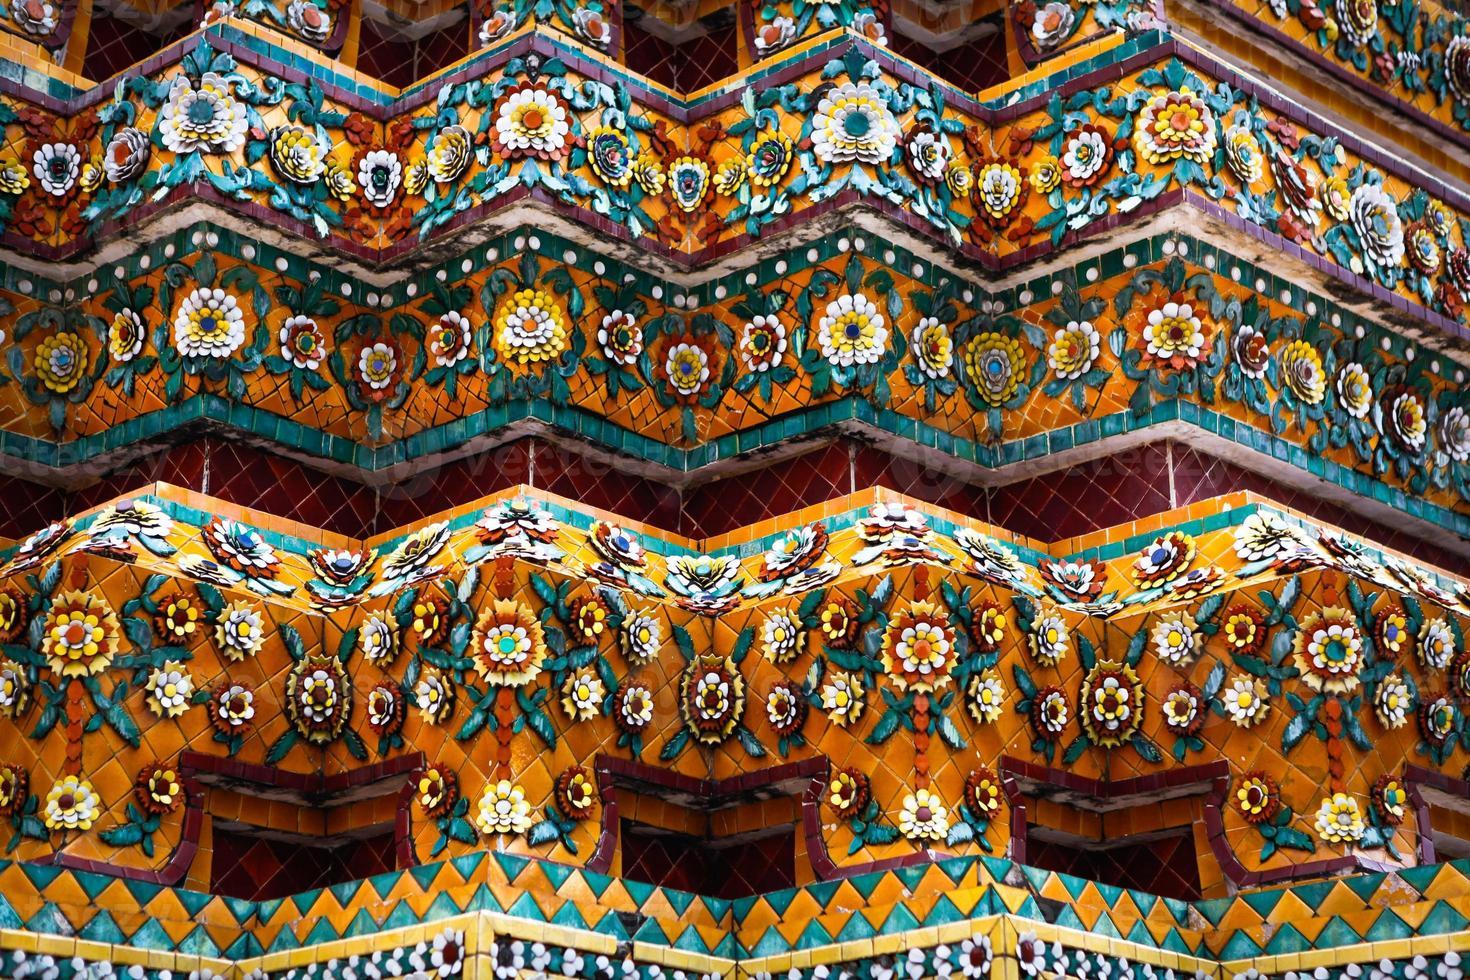 elementos decorativos de cerâmica do templo budista foto